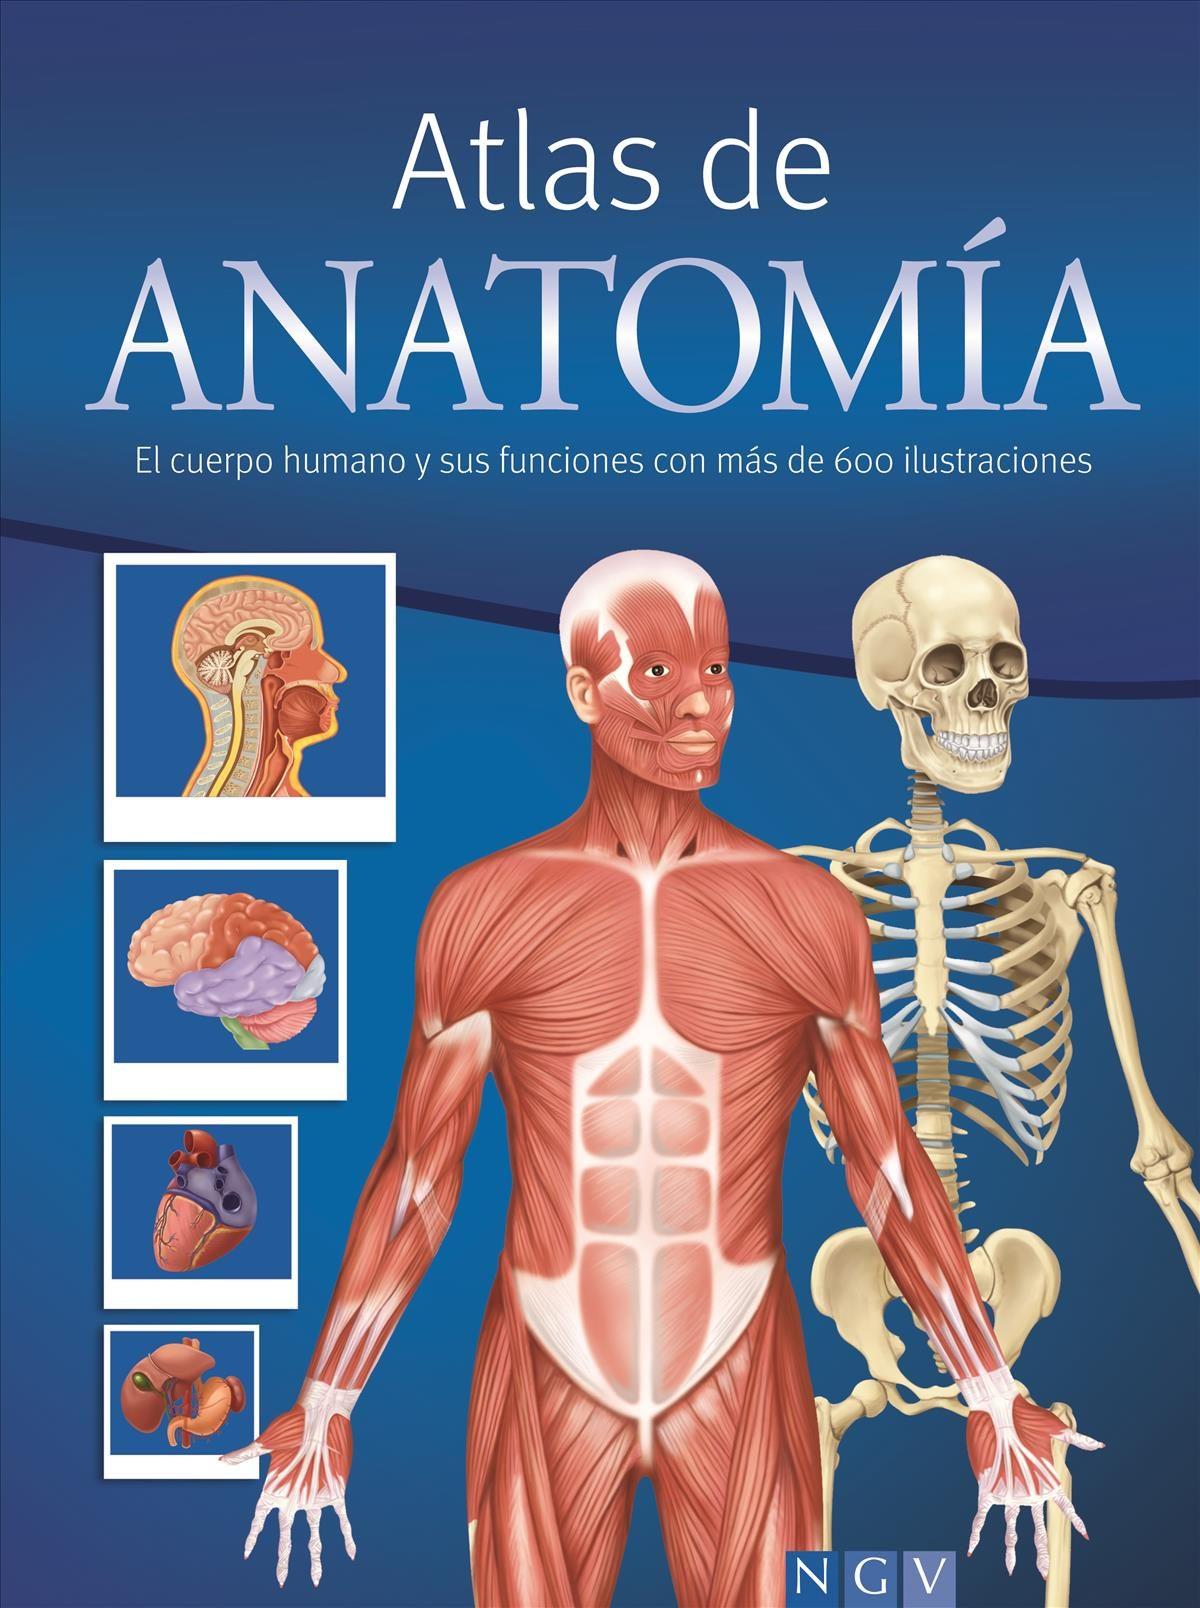 ATLAS DE ANATOMIA (RÚSTICA) | VV.AA. | Comprar libro 9783625006114